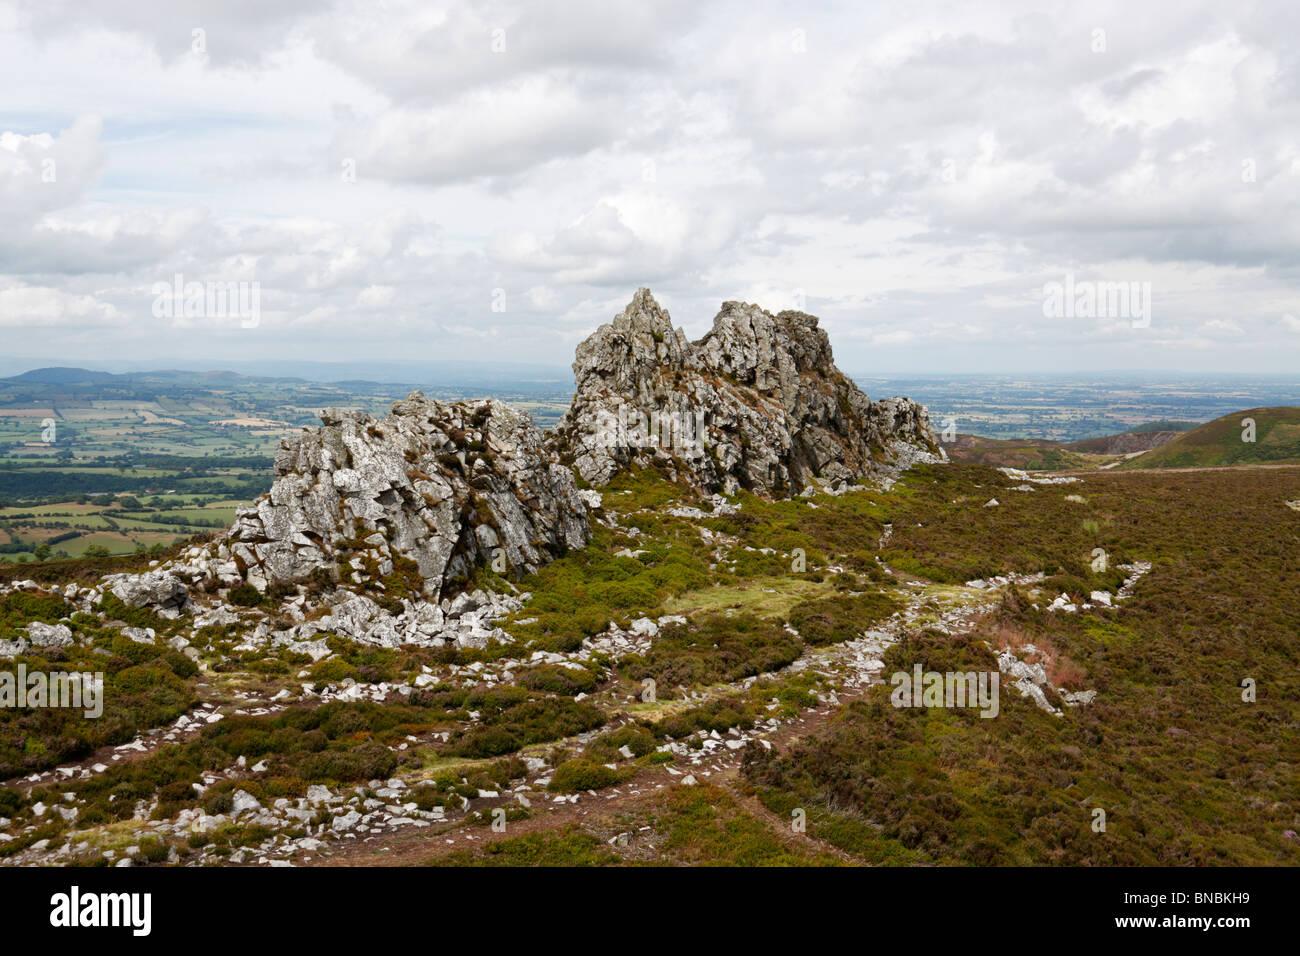 The Devil's Chair Quartzite outcrops at Stiperstones, Shropshire Hills AONB - Stock Image